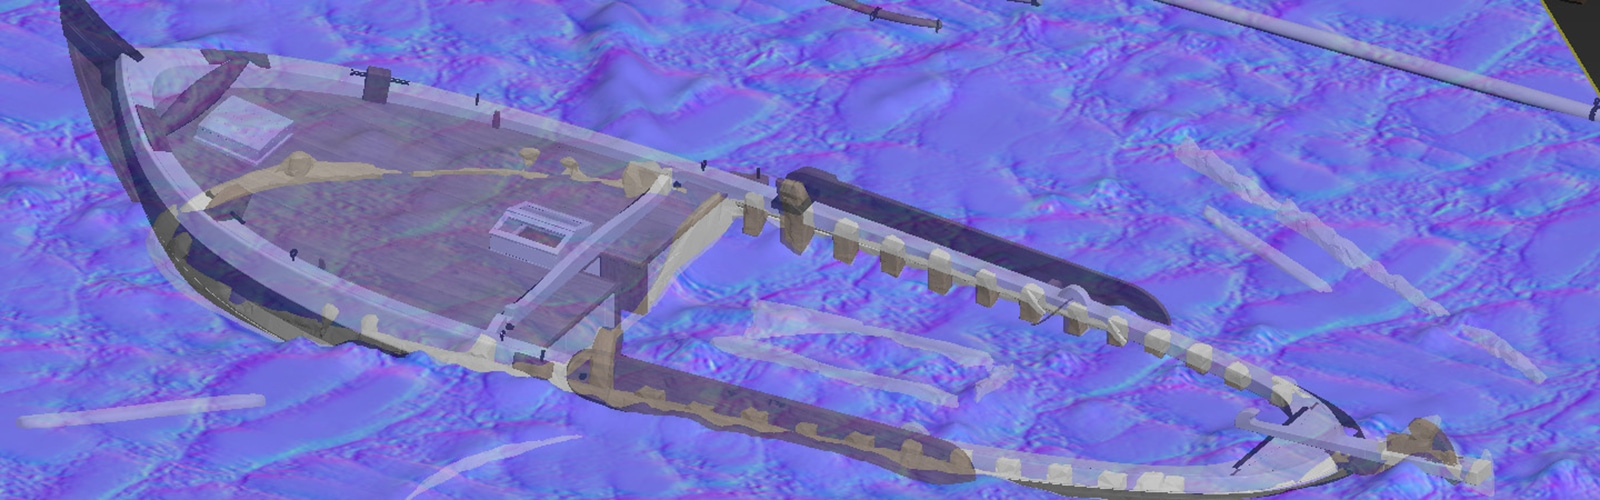 Botter wrak scan data overlay intacte wrak